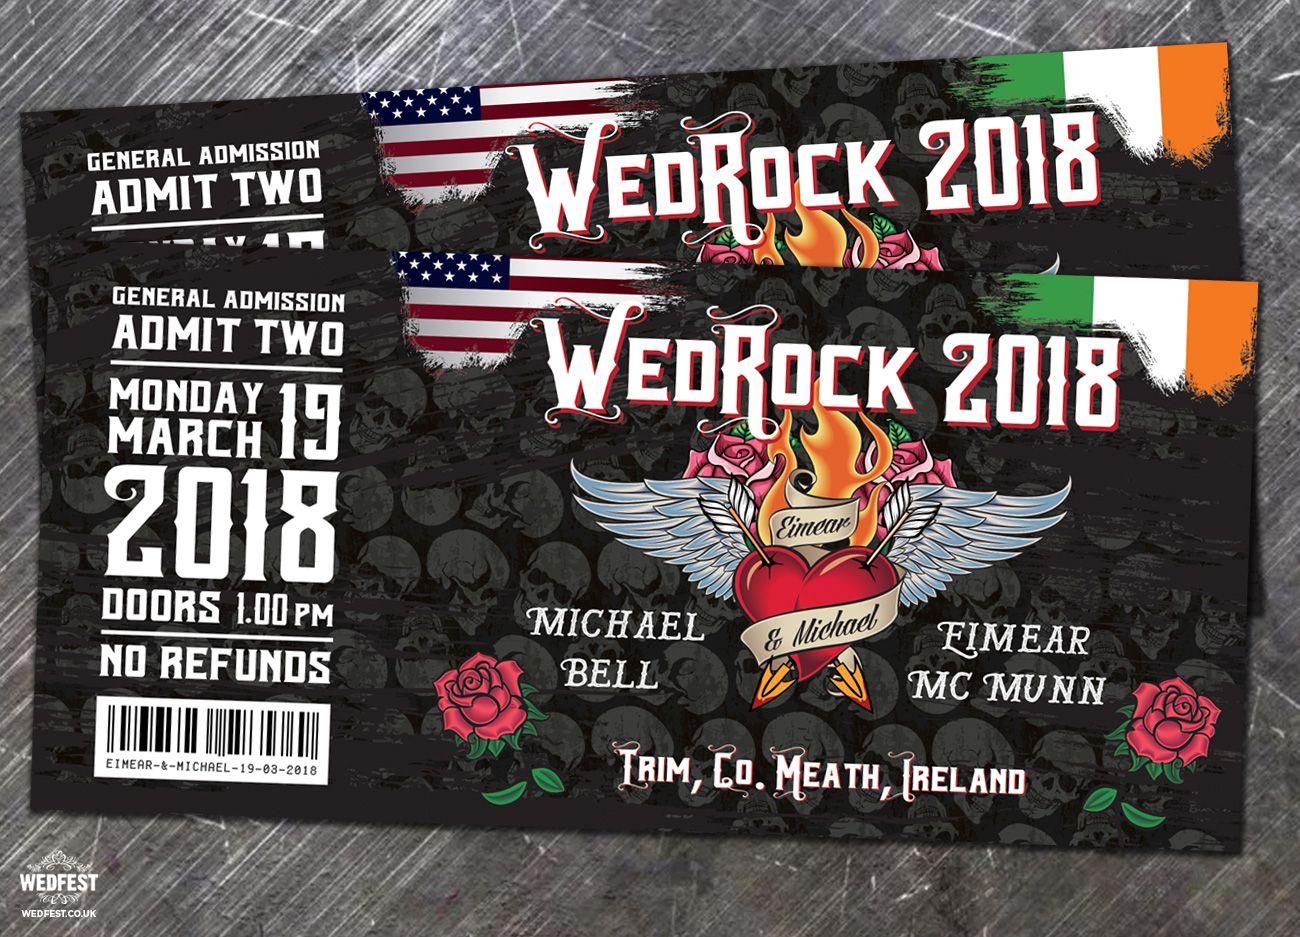 Ireland Usa Rock And Roll Tattoo Theme Wedding Invite Wedfest: Heavy Metal Wedding Invitations At Websimilar.org